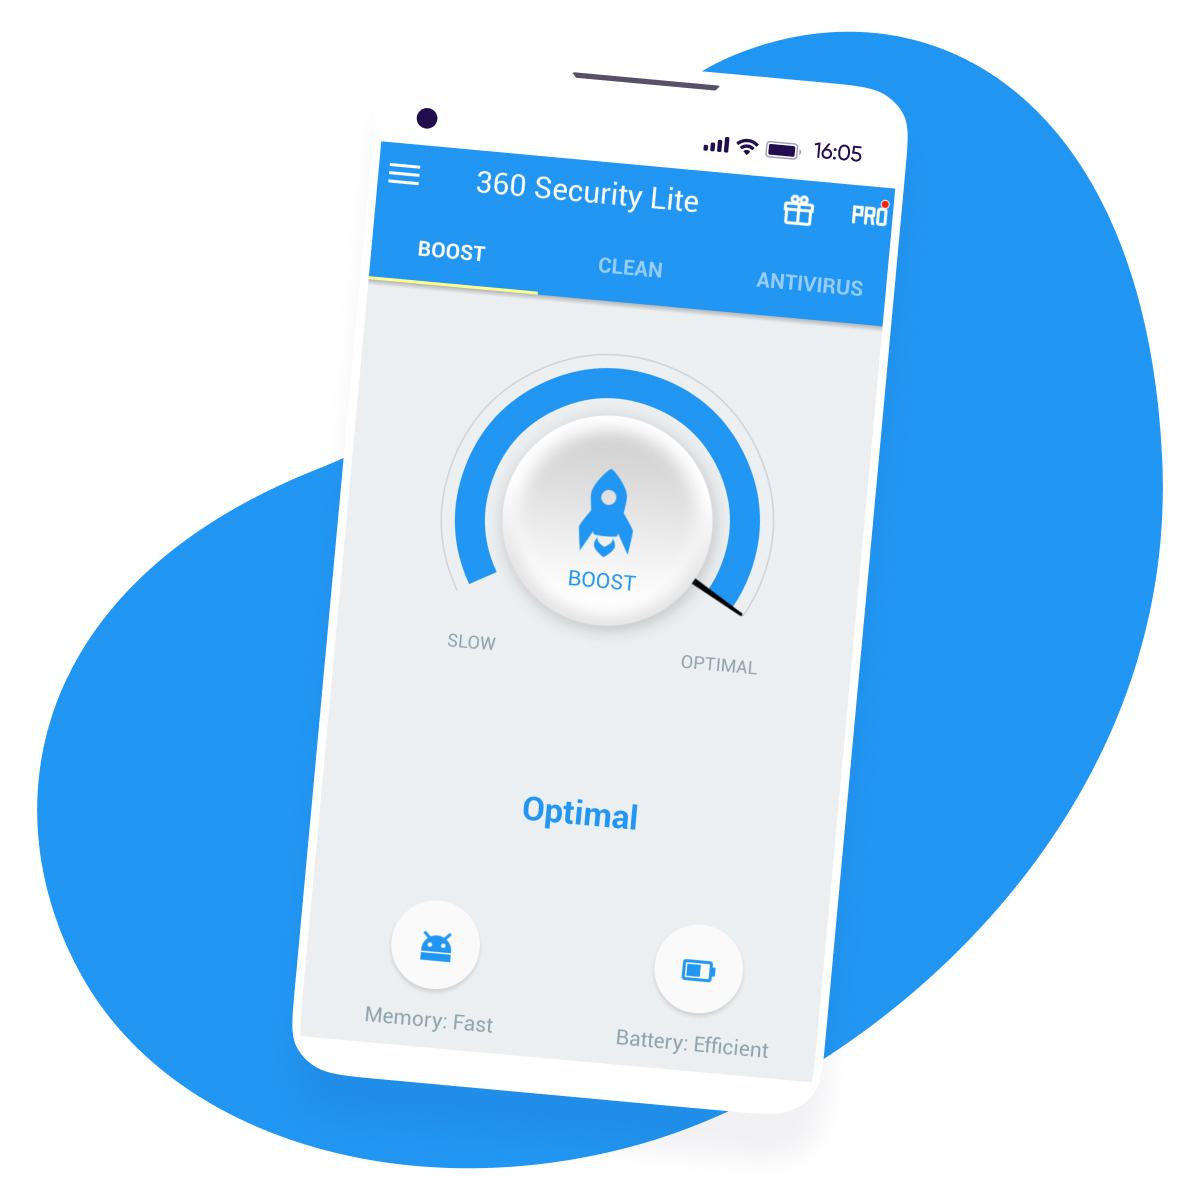 360security AppsFlyer Customer